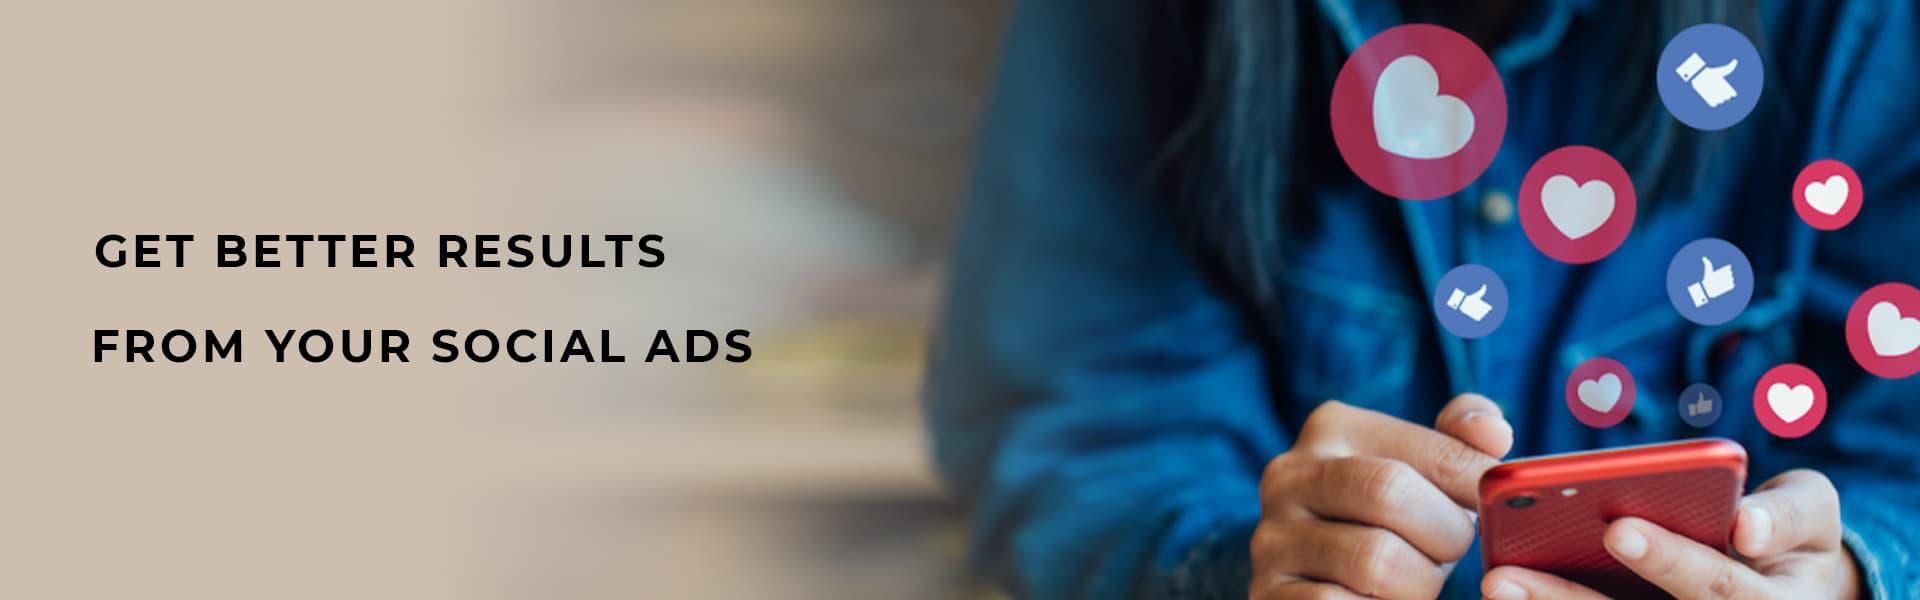 Born Intelligence, Digital Marketing Agency, Digital Marketing, Social Ads, Facebook Ads, Instagram Ads, Google Ads, Leads, Lead Generation, Lead Generation Specialist, organic reach, advertising on social media, social media advertising, organic strategy, social media, Successful social media management, social media organic strategy,